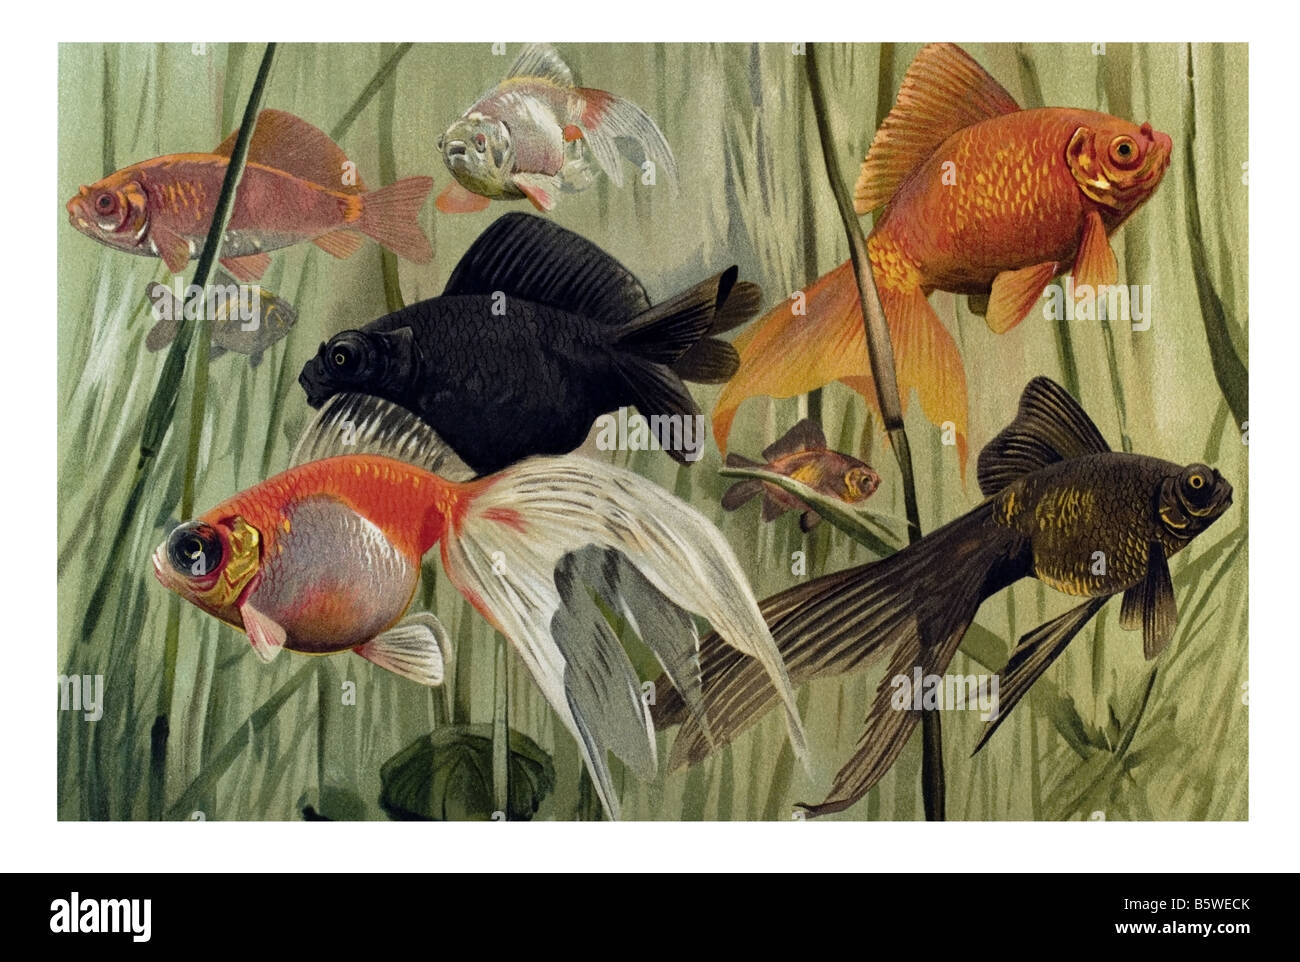 Freshwater aquarium fish documentary - Goldfish Carassius Auratus Domesticated Fish Aquarium Fish Water Garden Fish Carp Family Cyprinidae